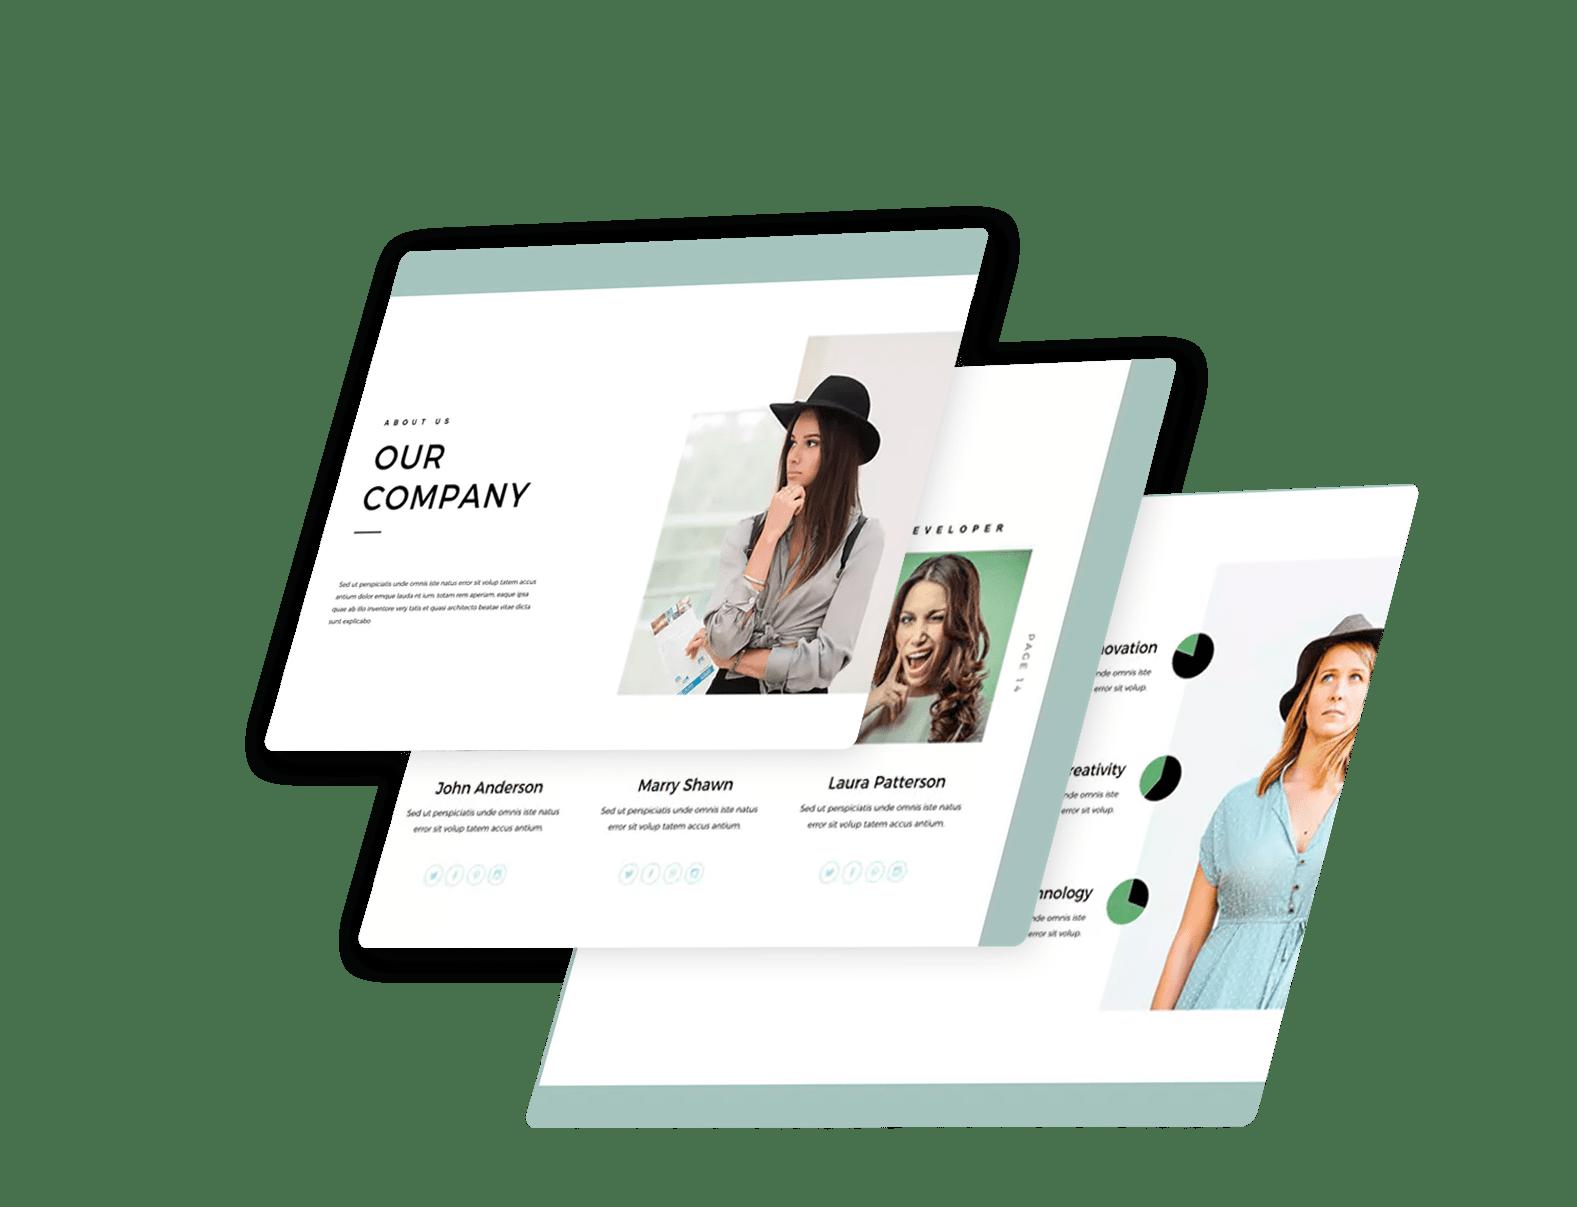 Macbook-display image 3